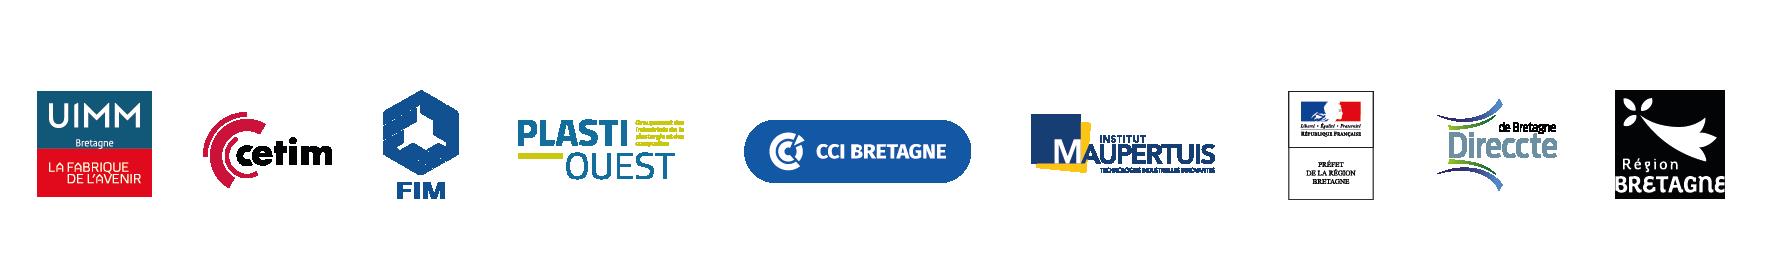 Bloc marque Partenaires - CDIB